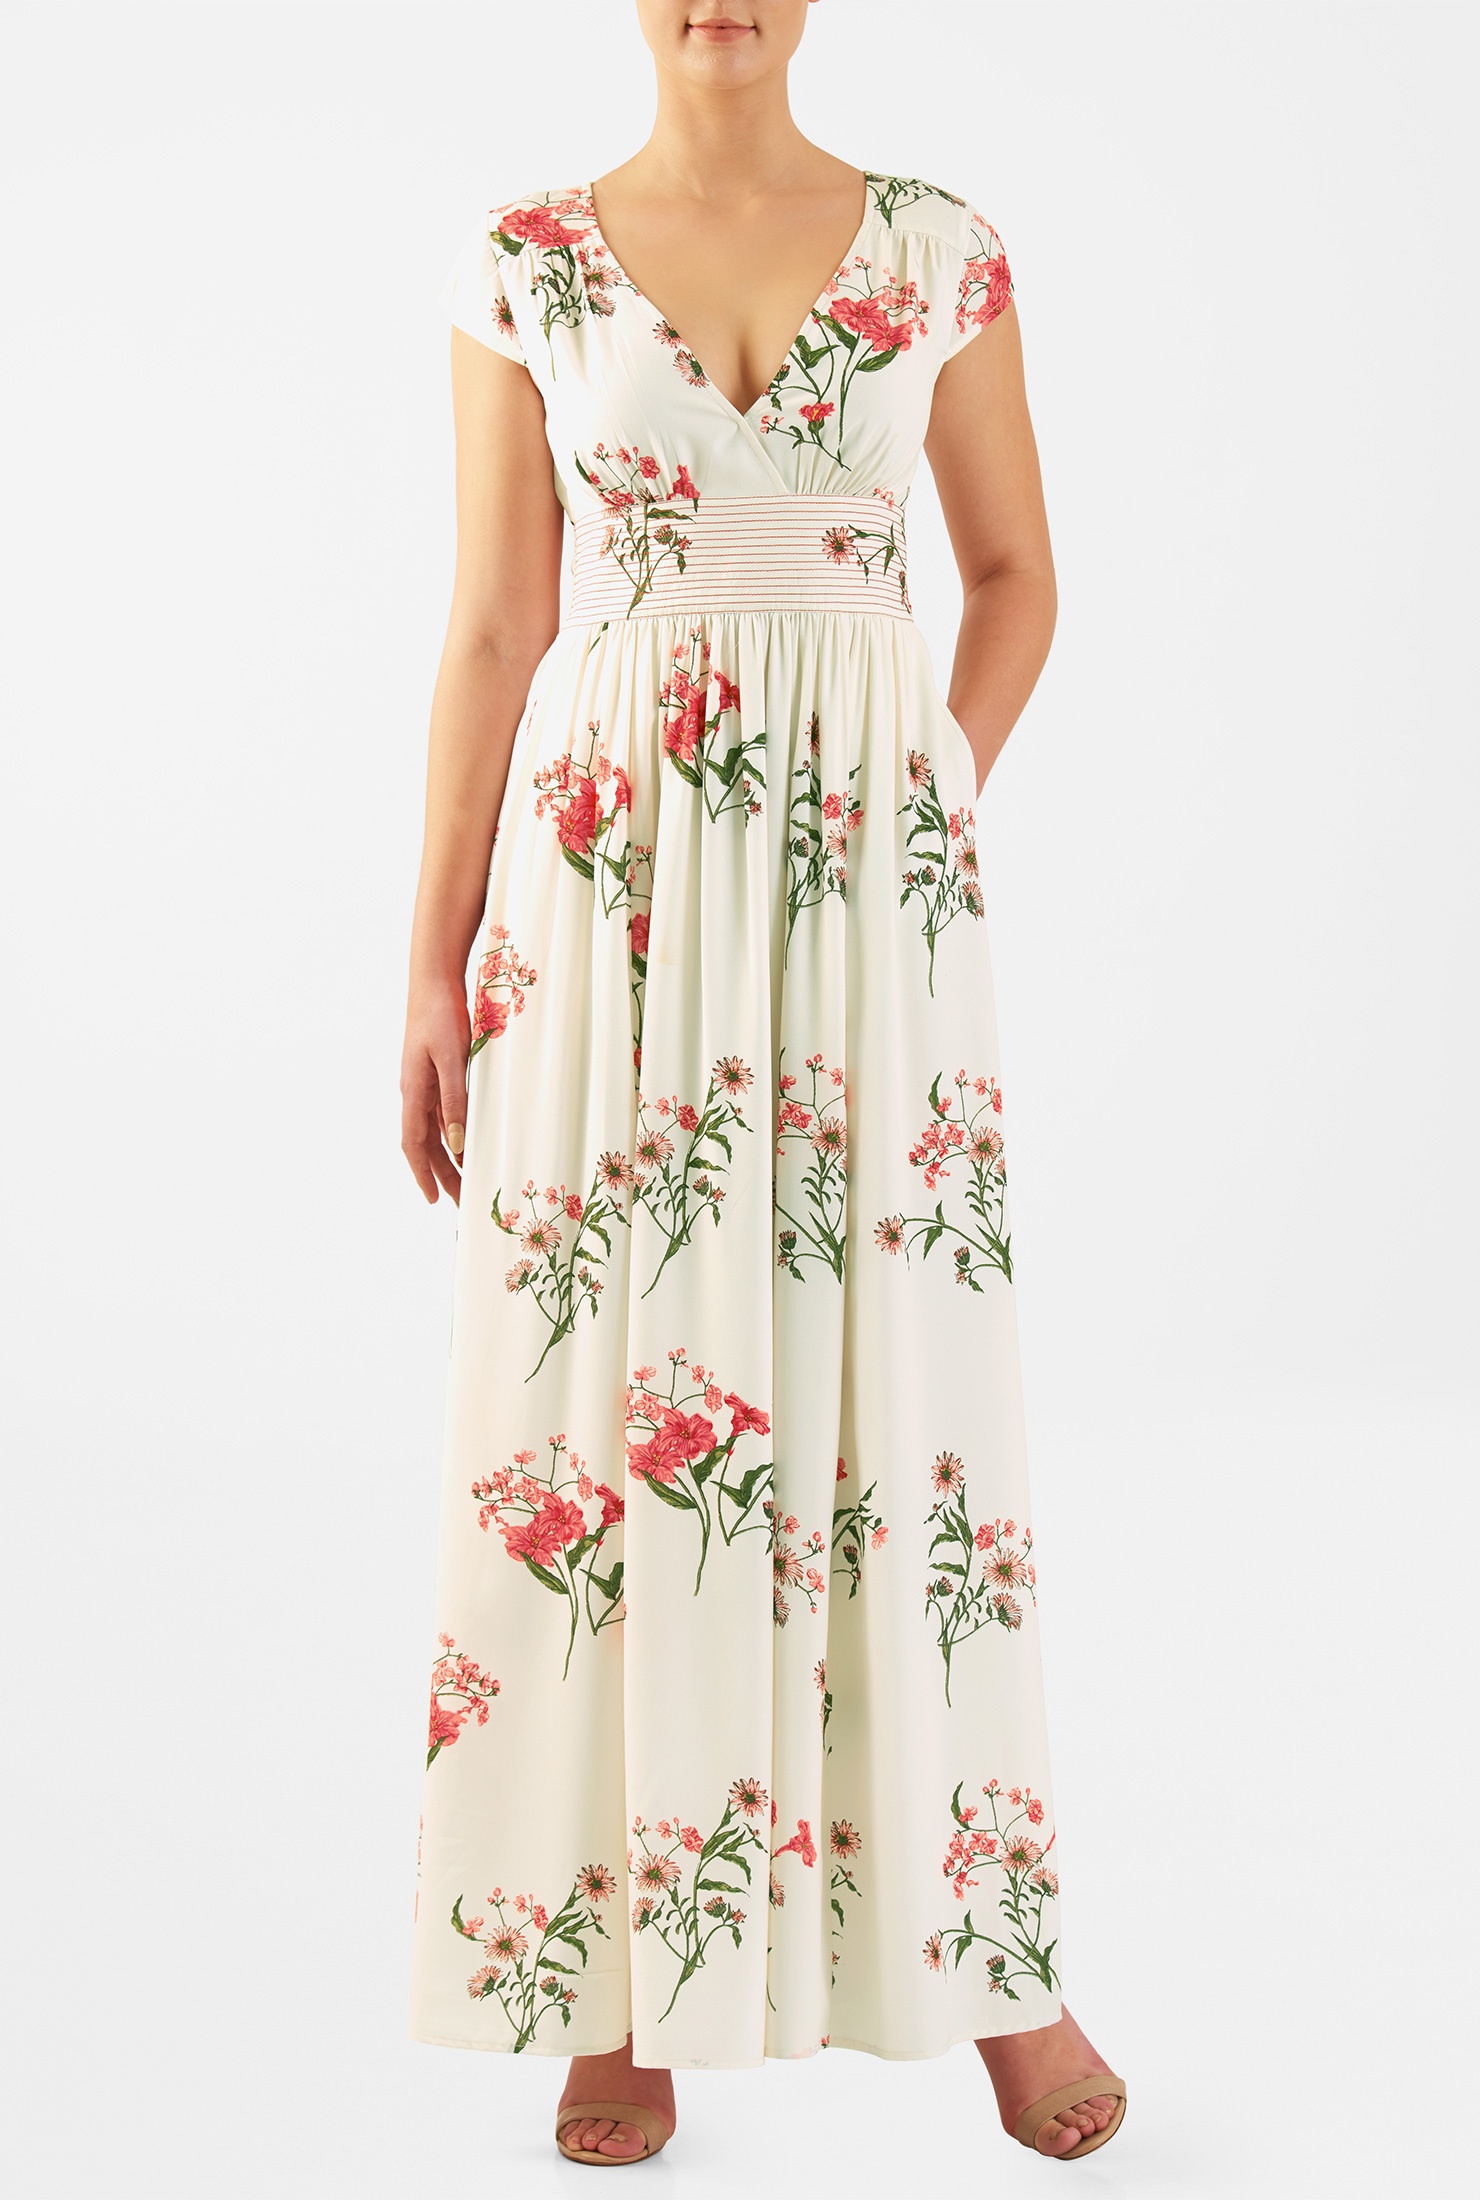 Eshakti Womens Floral Print Trapunto Stitch Waist Maxi Dress